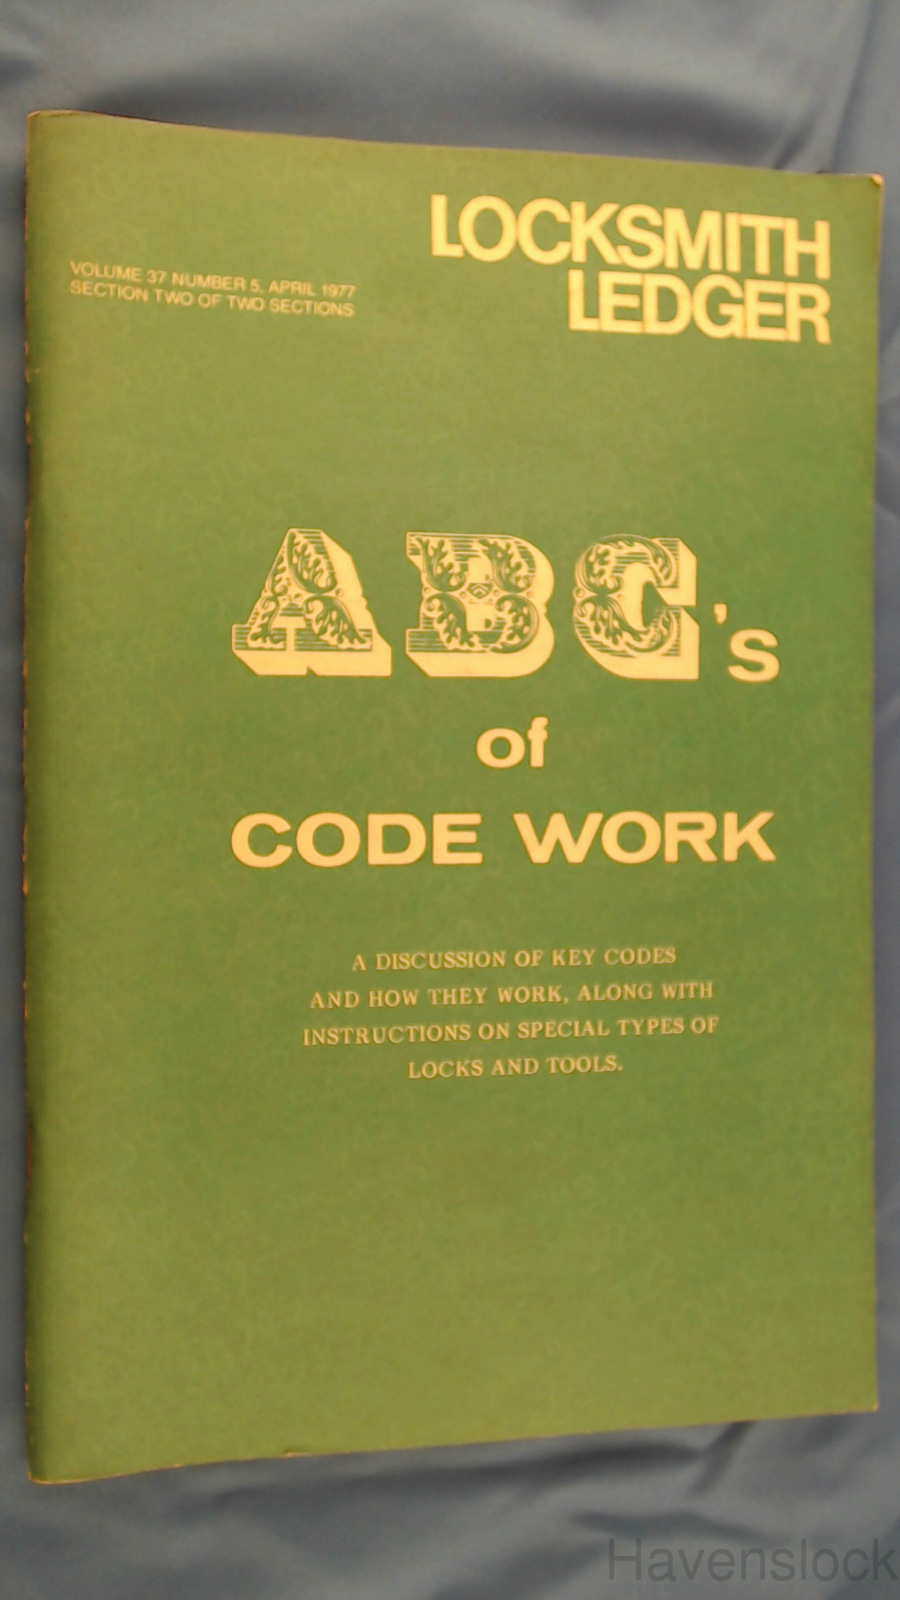 Locksmith Ledger, Vol. 37, No. 5: ABC's of Code Wo